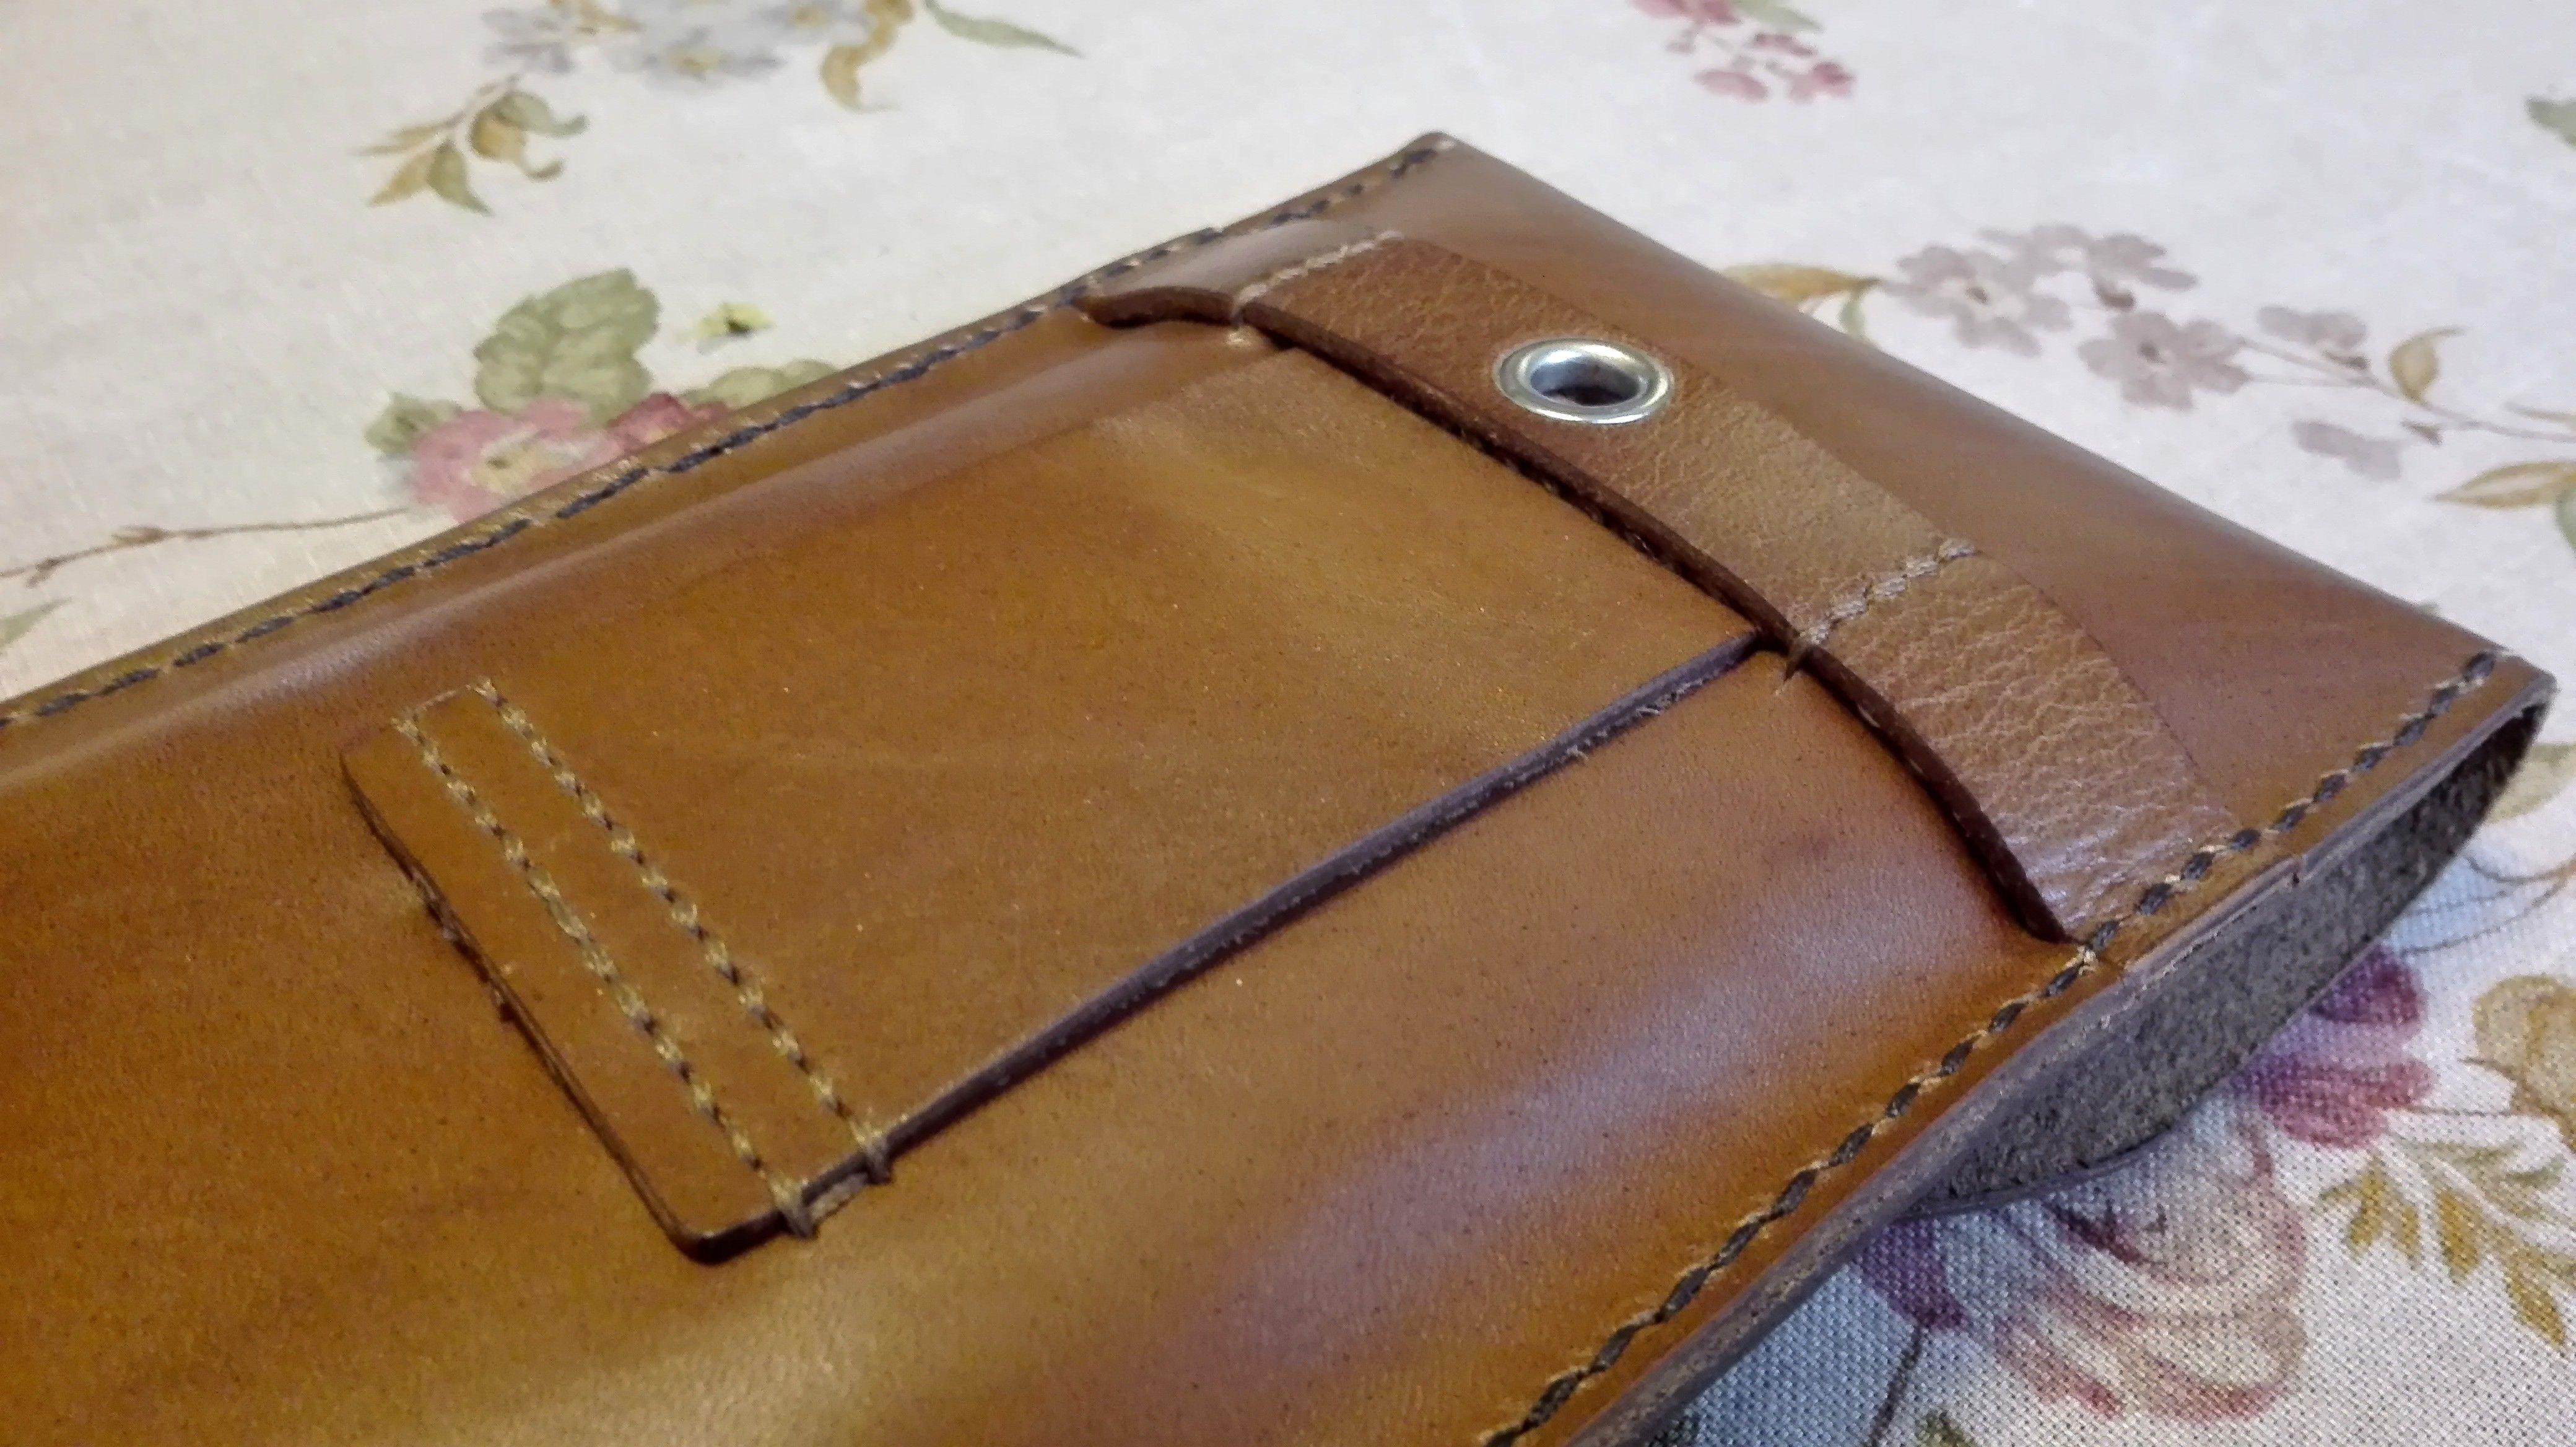 Durable Cowhide Card Pocket Docs Pocket Belt Loop Neck Strap Loop